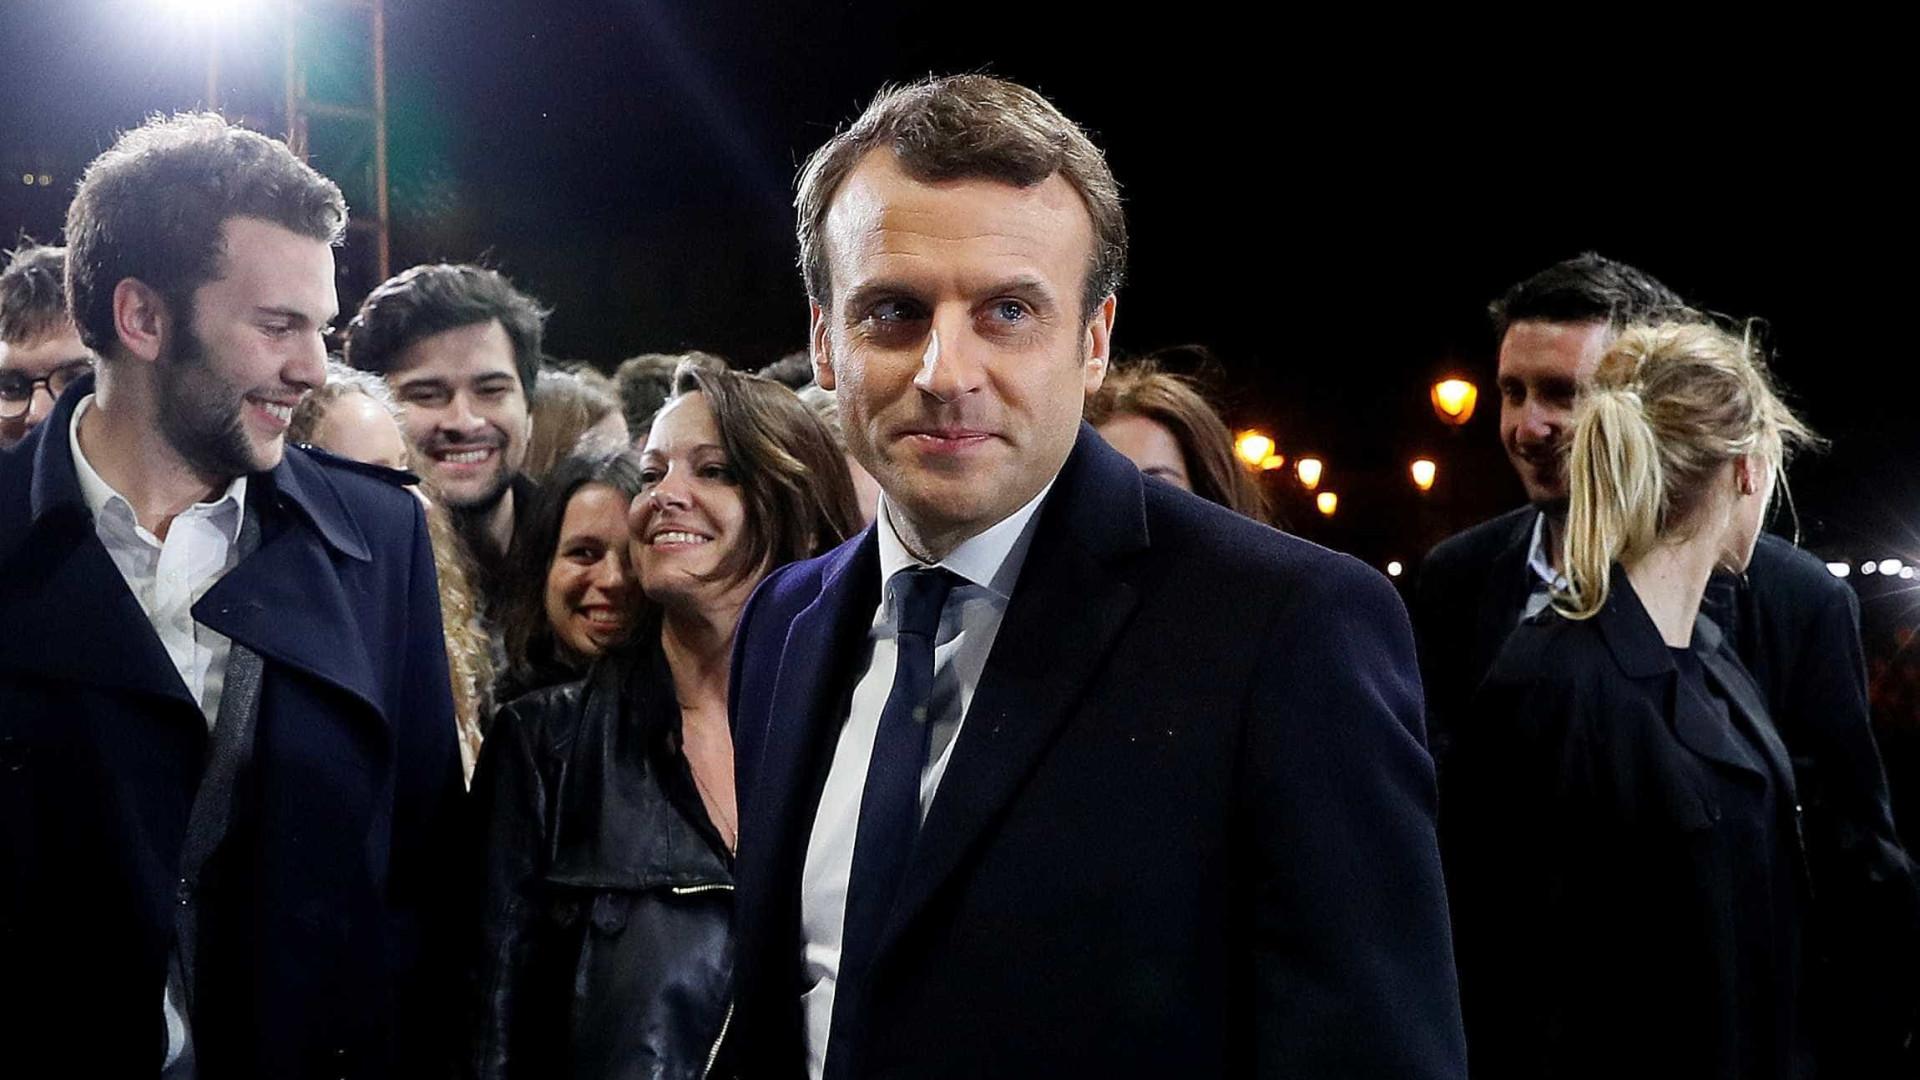 Rússia tentou espionar Emmanuel Macron através do Facebook